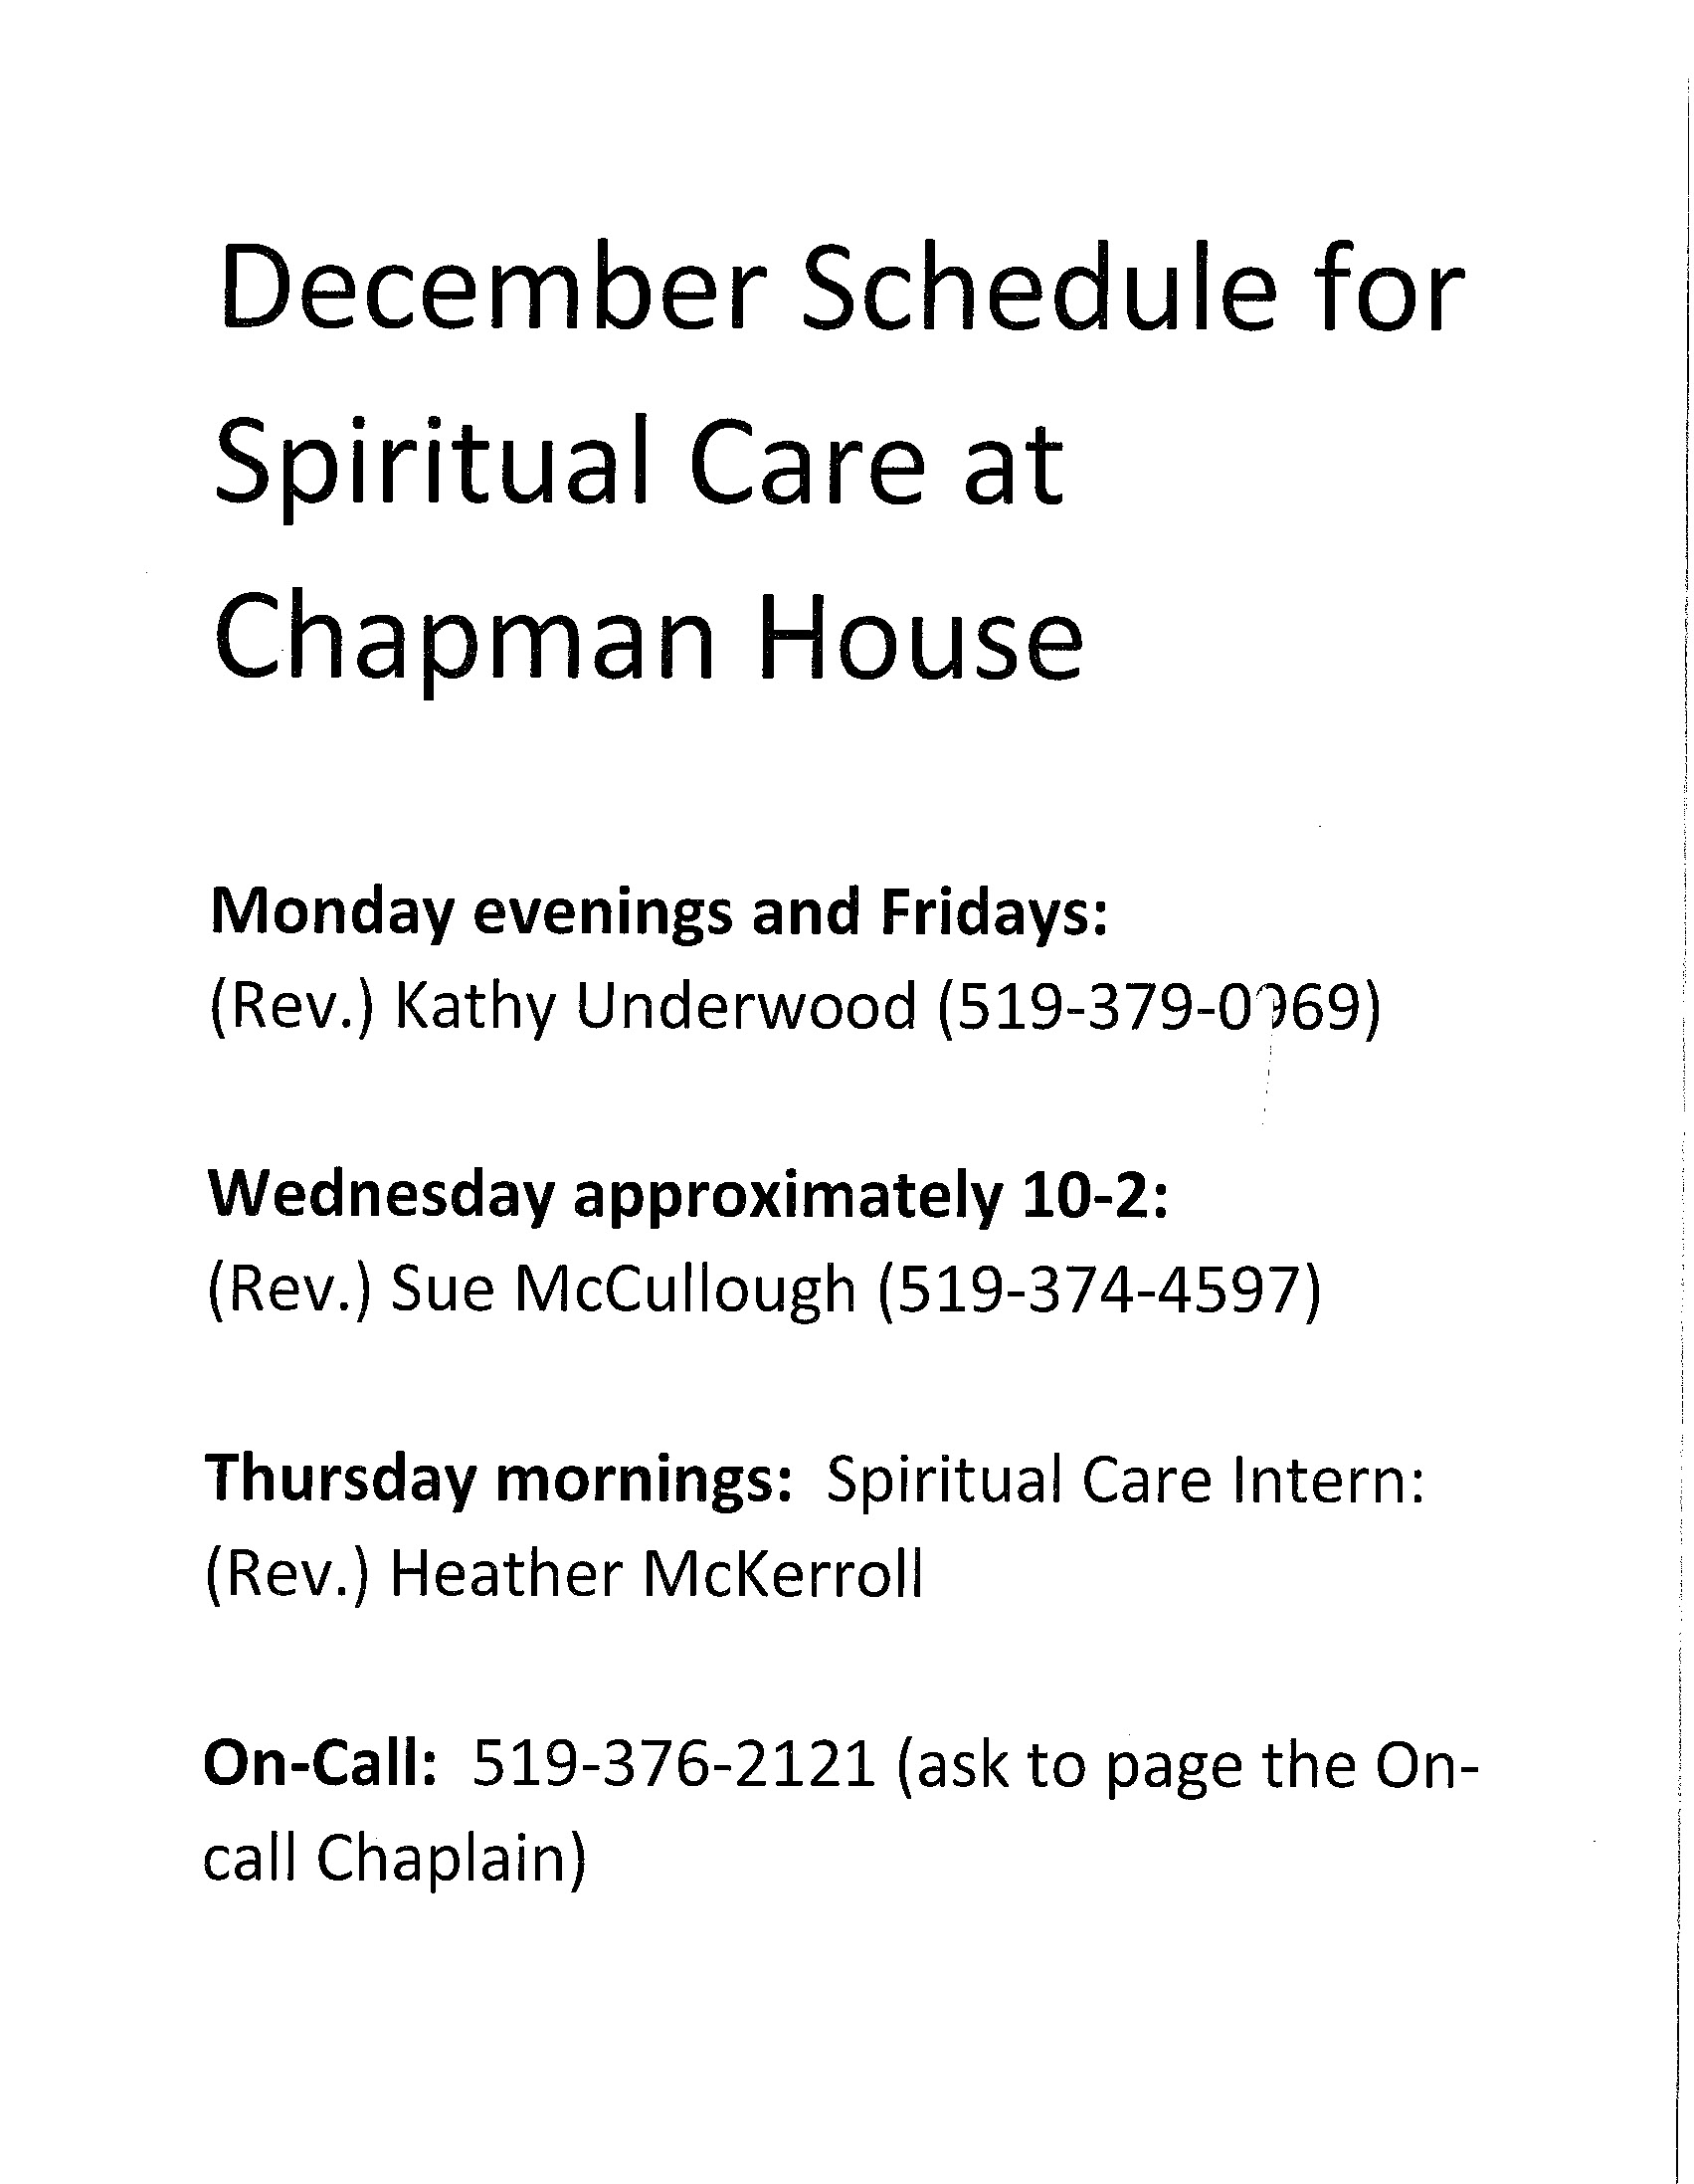 December Spiritual Care schedule.jpg